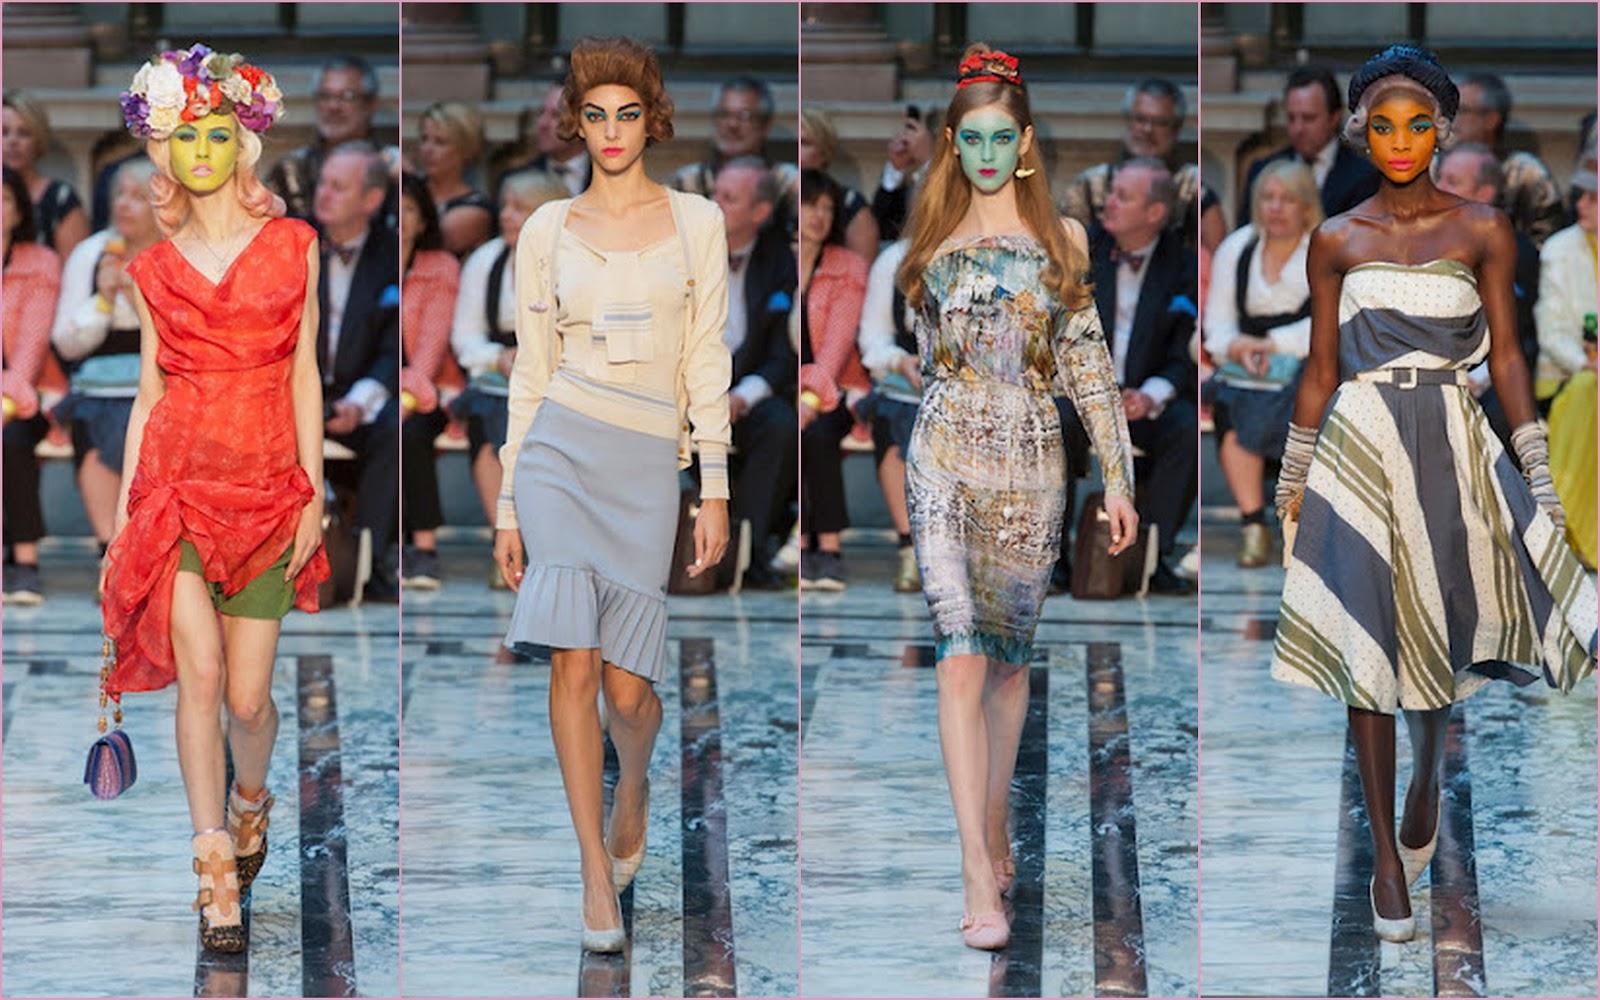 http://4.bp.blogspot.com/-fSqkjD0IpQE/UF_ZBuFR-3I/AAAAAAAAH7o/ItnogIevuLI/s1600/London+Vivienne+Westwood.jpg